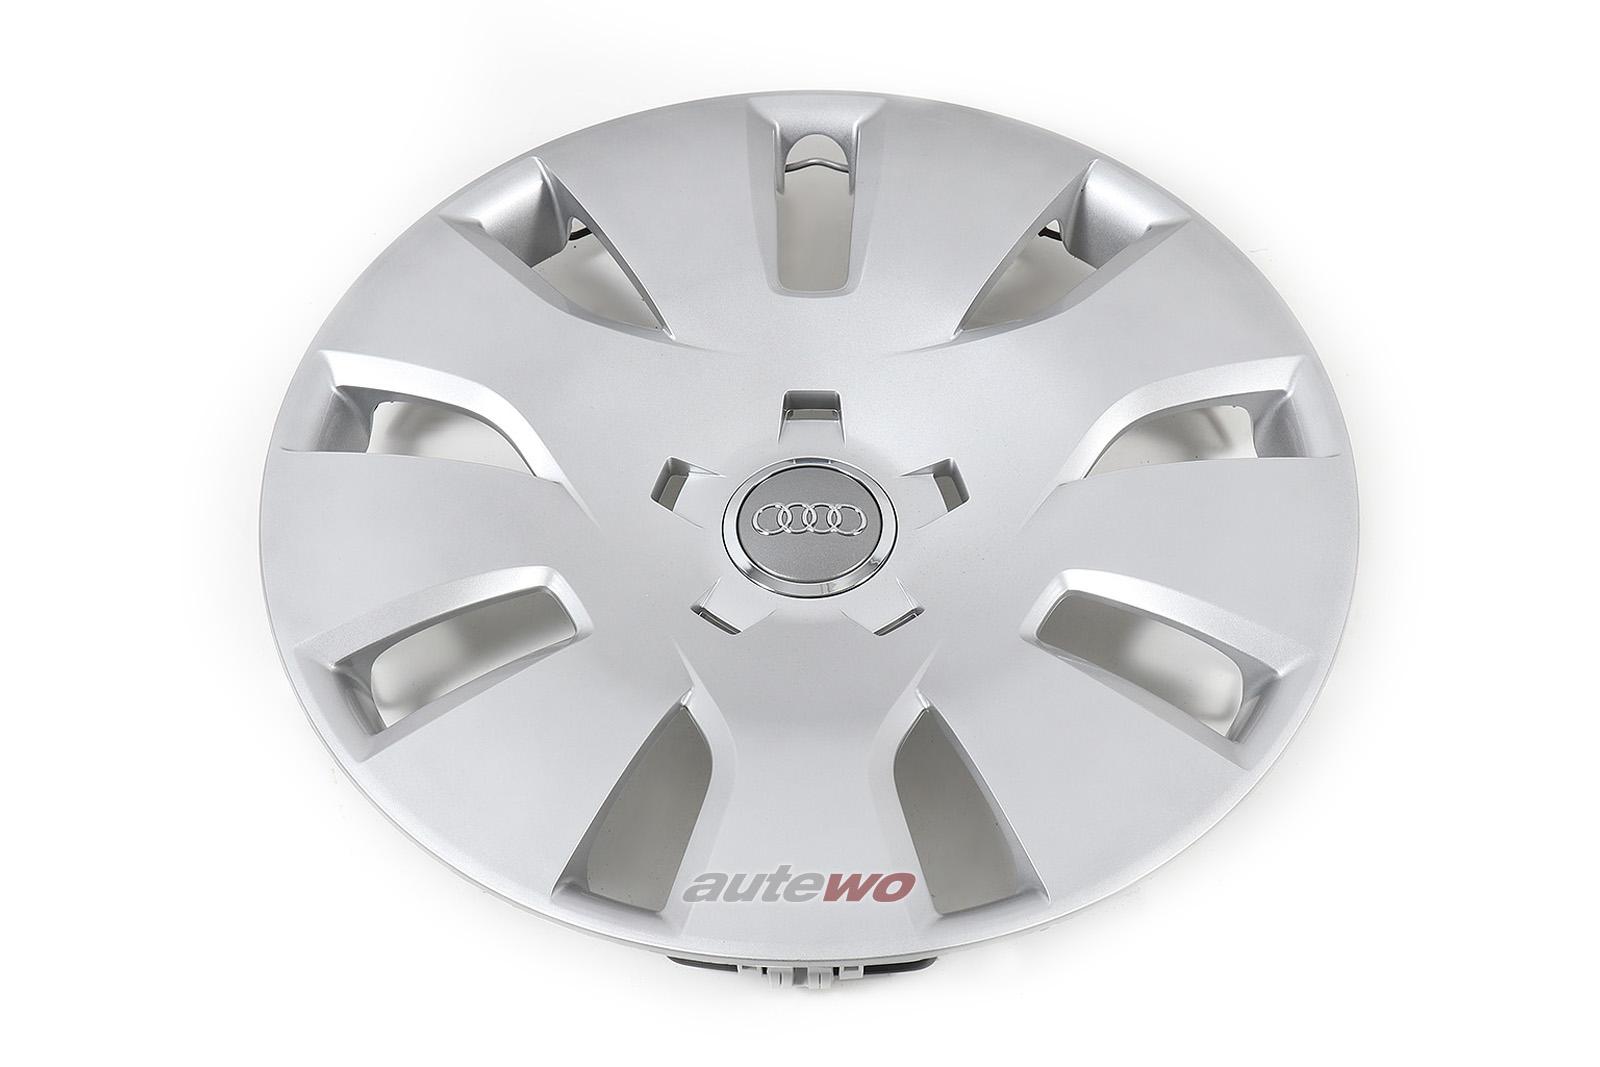 8K0601147 NEU Audi A4 8K/B8 original Radkappe 16 Zoll